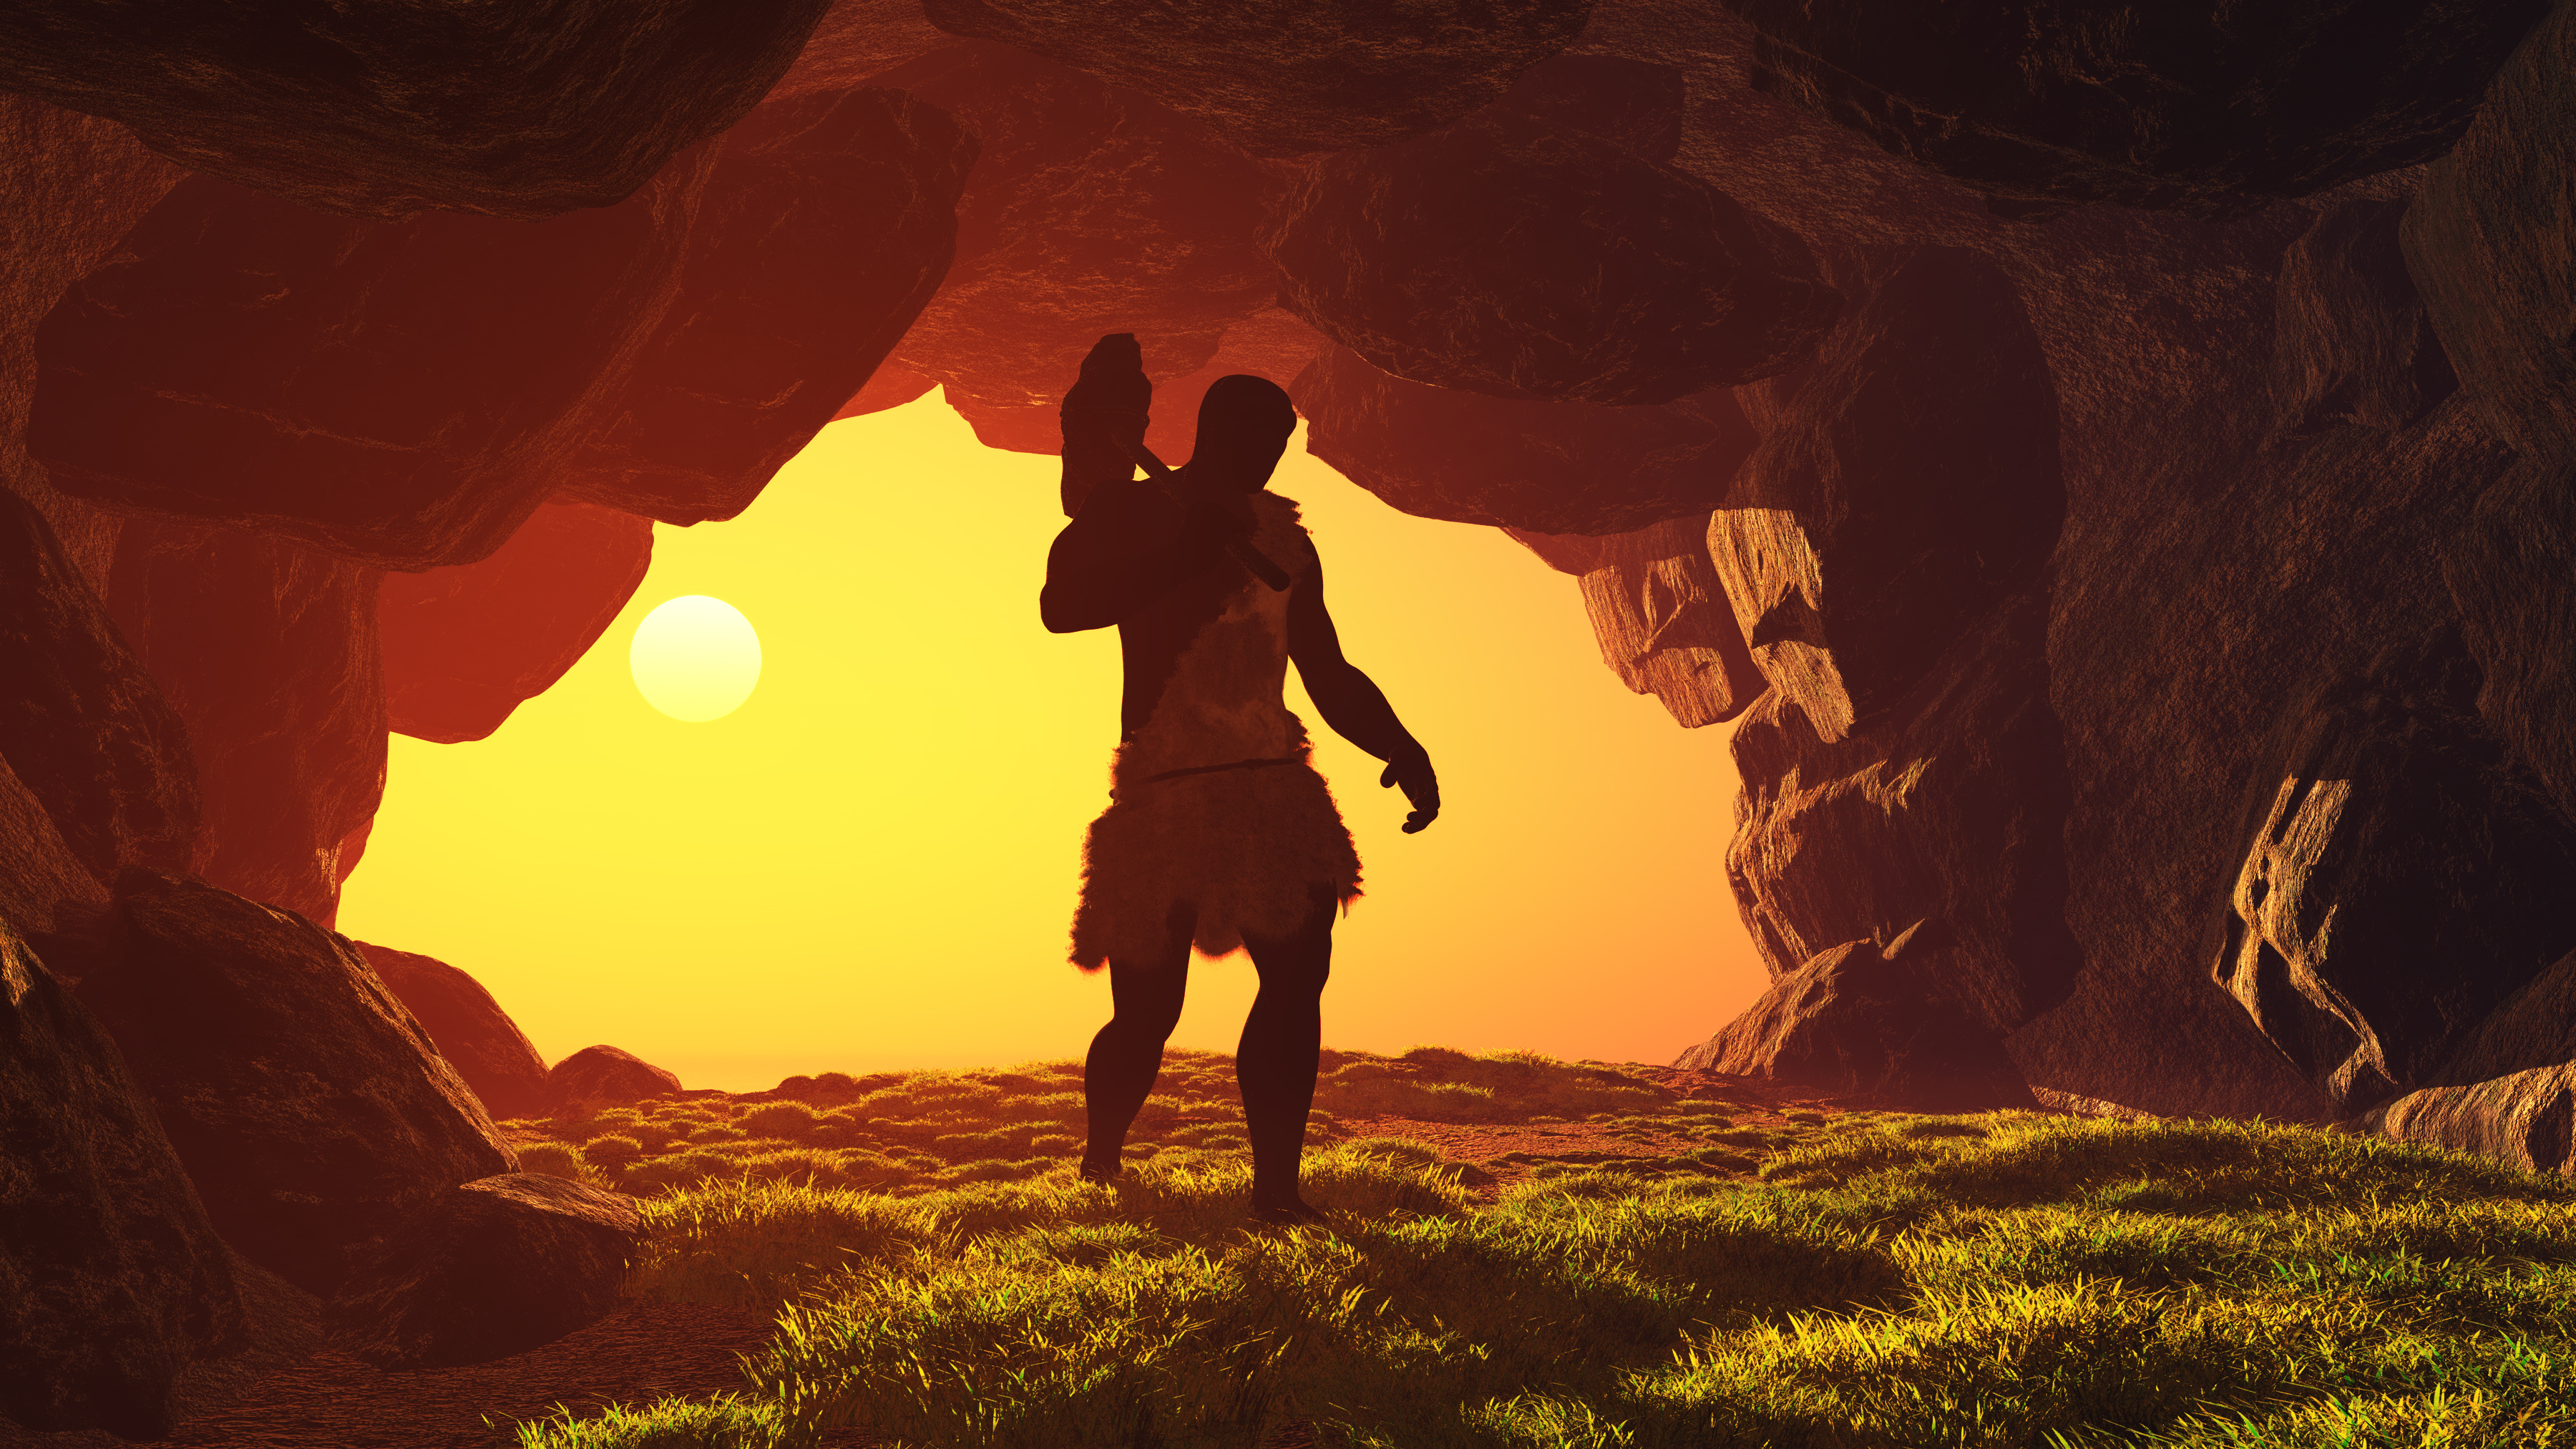 Caveman-AdobeStock_62085492